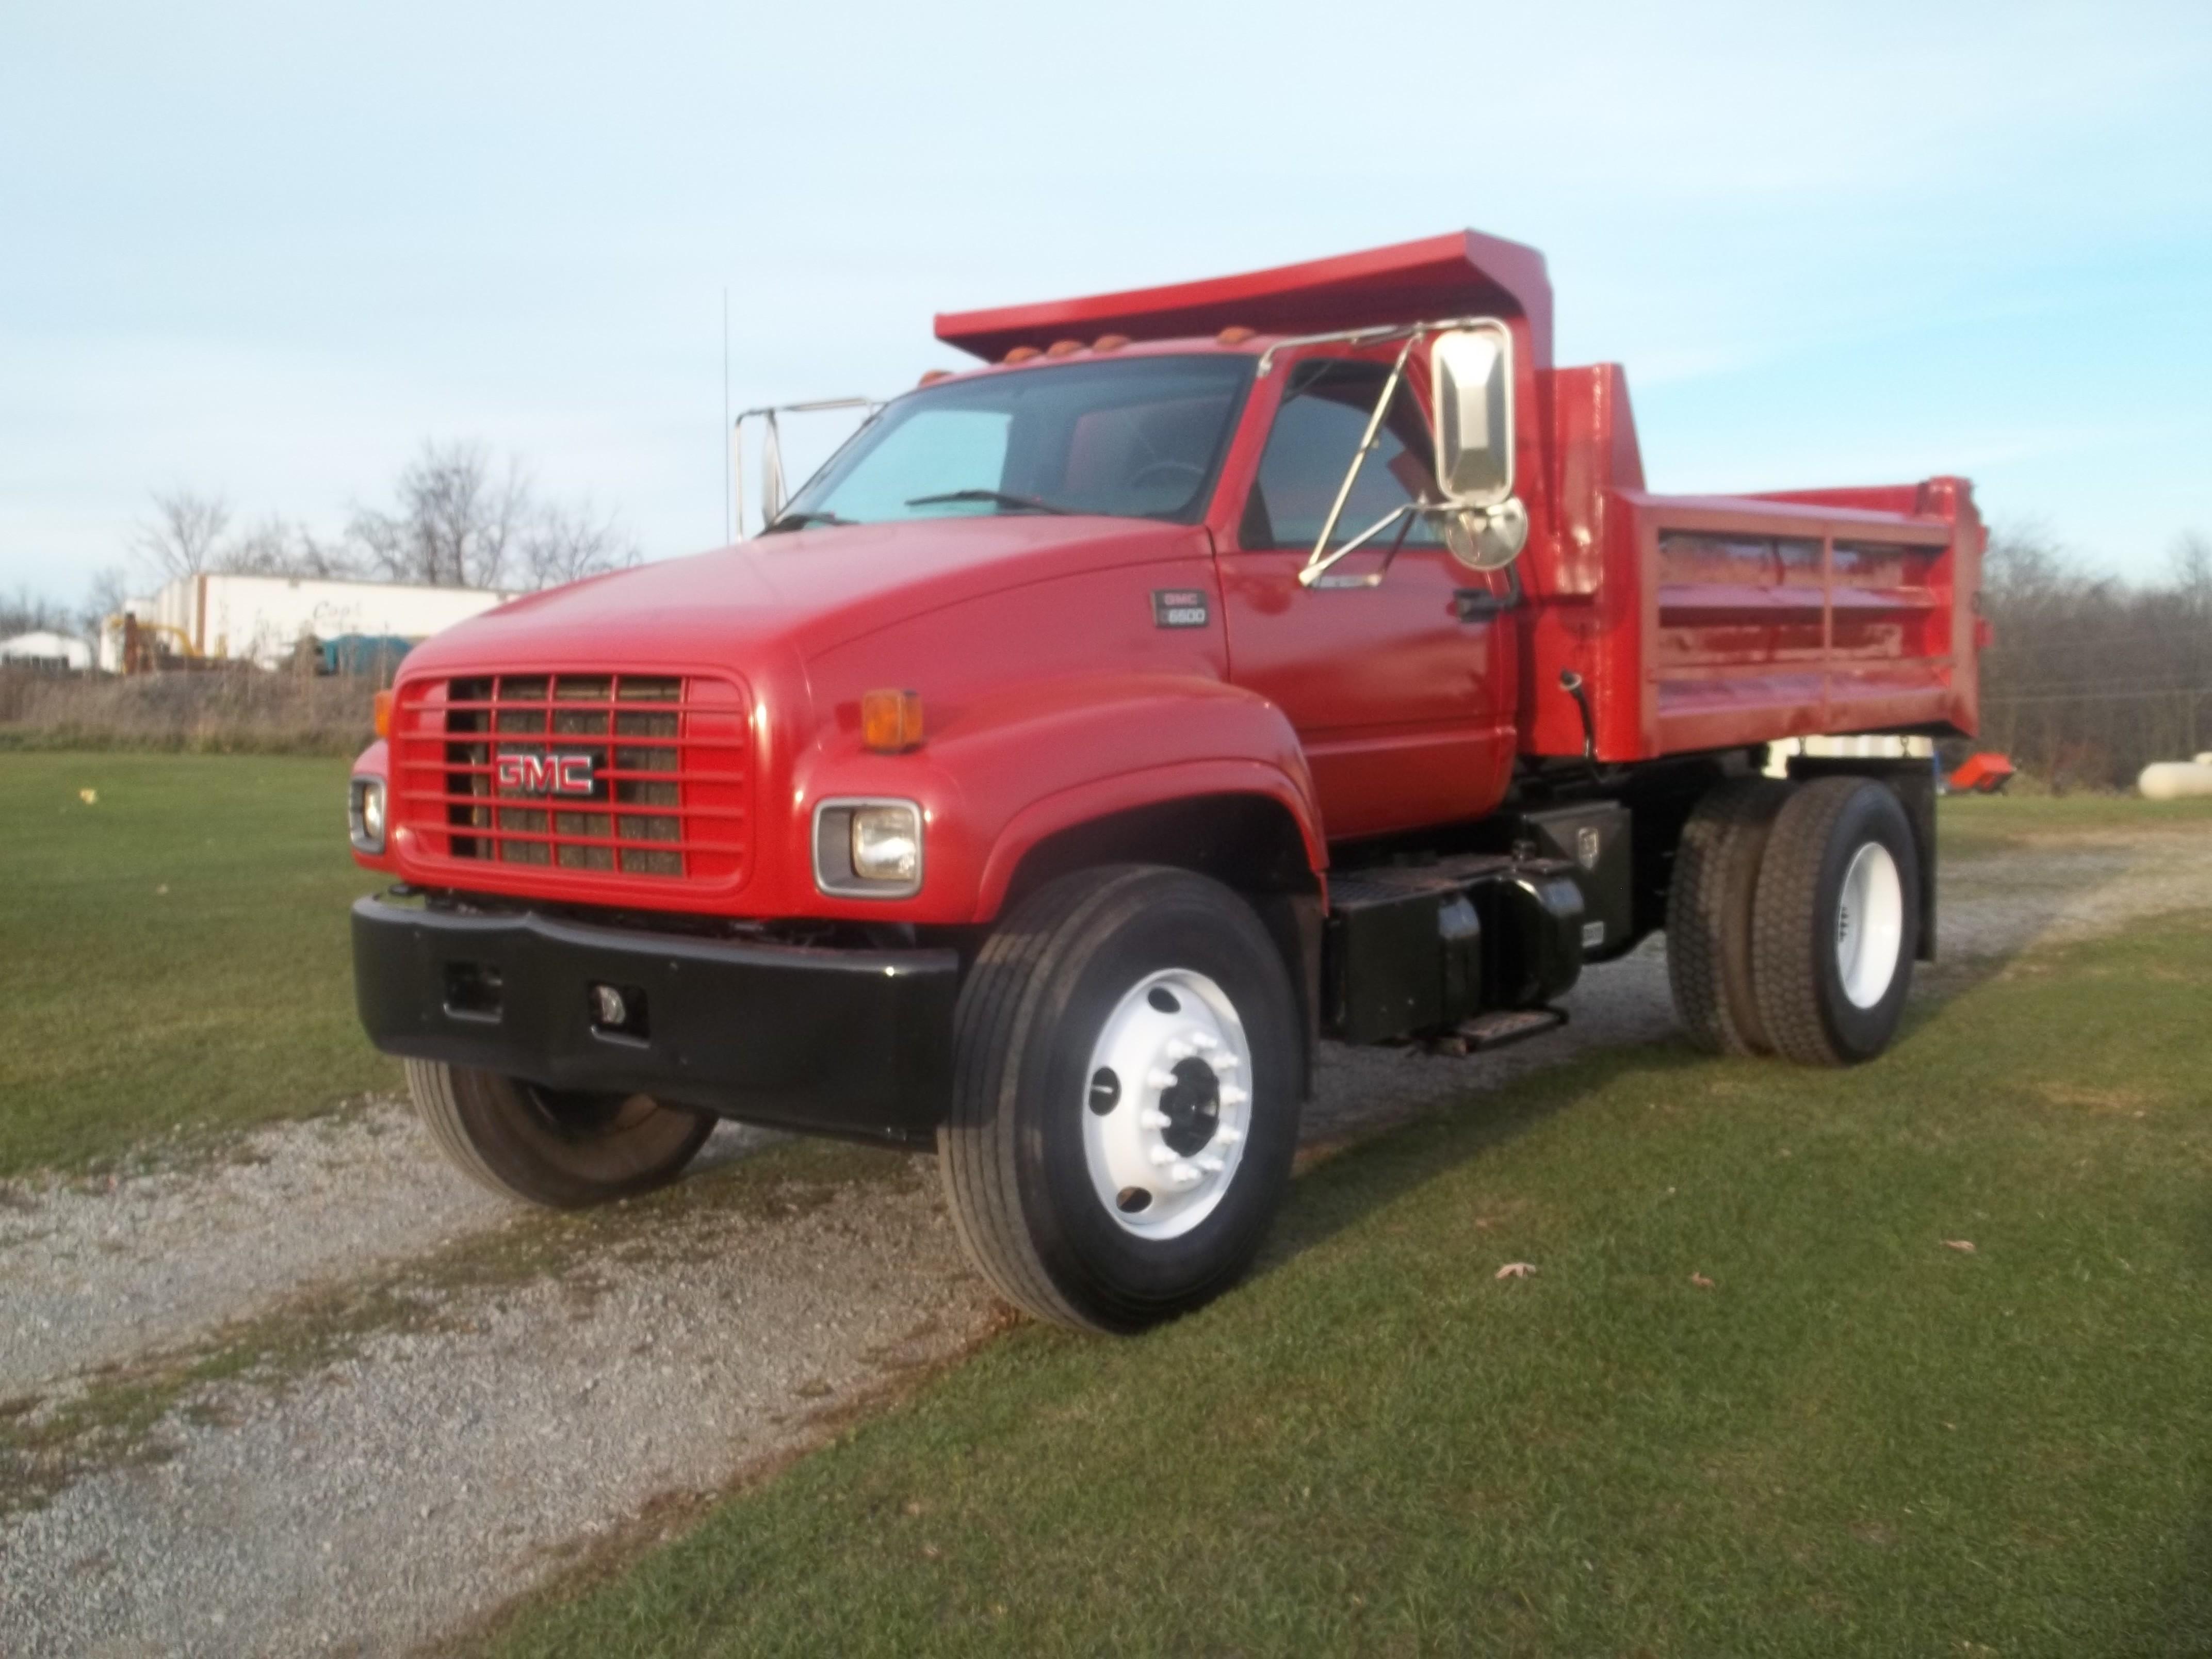 Used, 2000, GMC, 6500, Dump Trucks